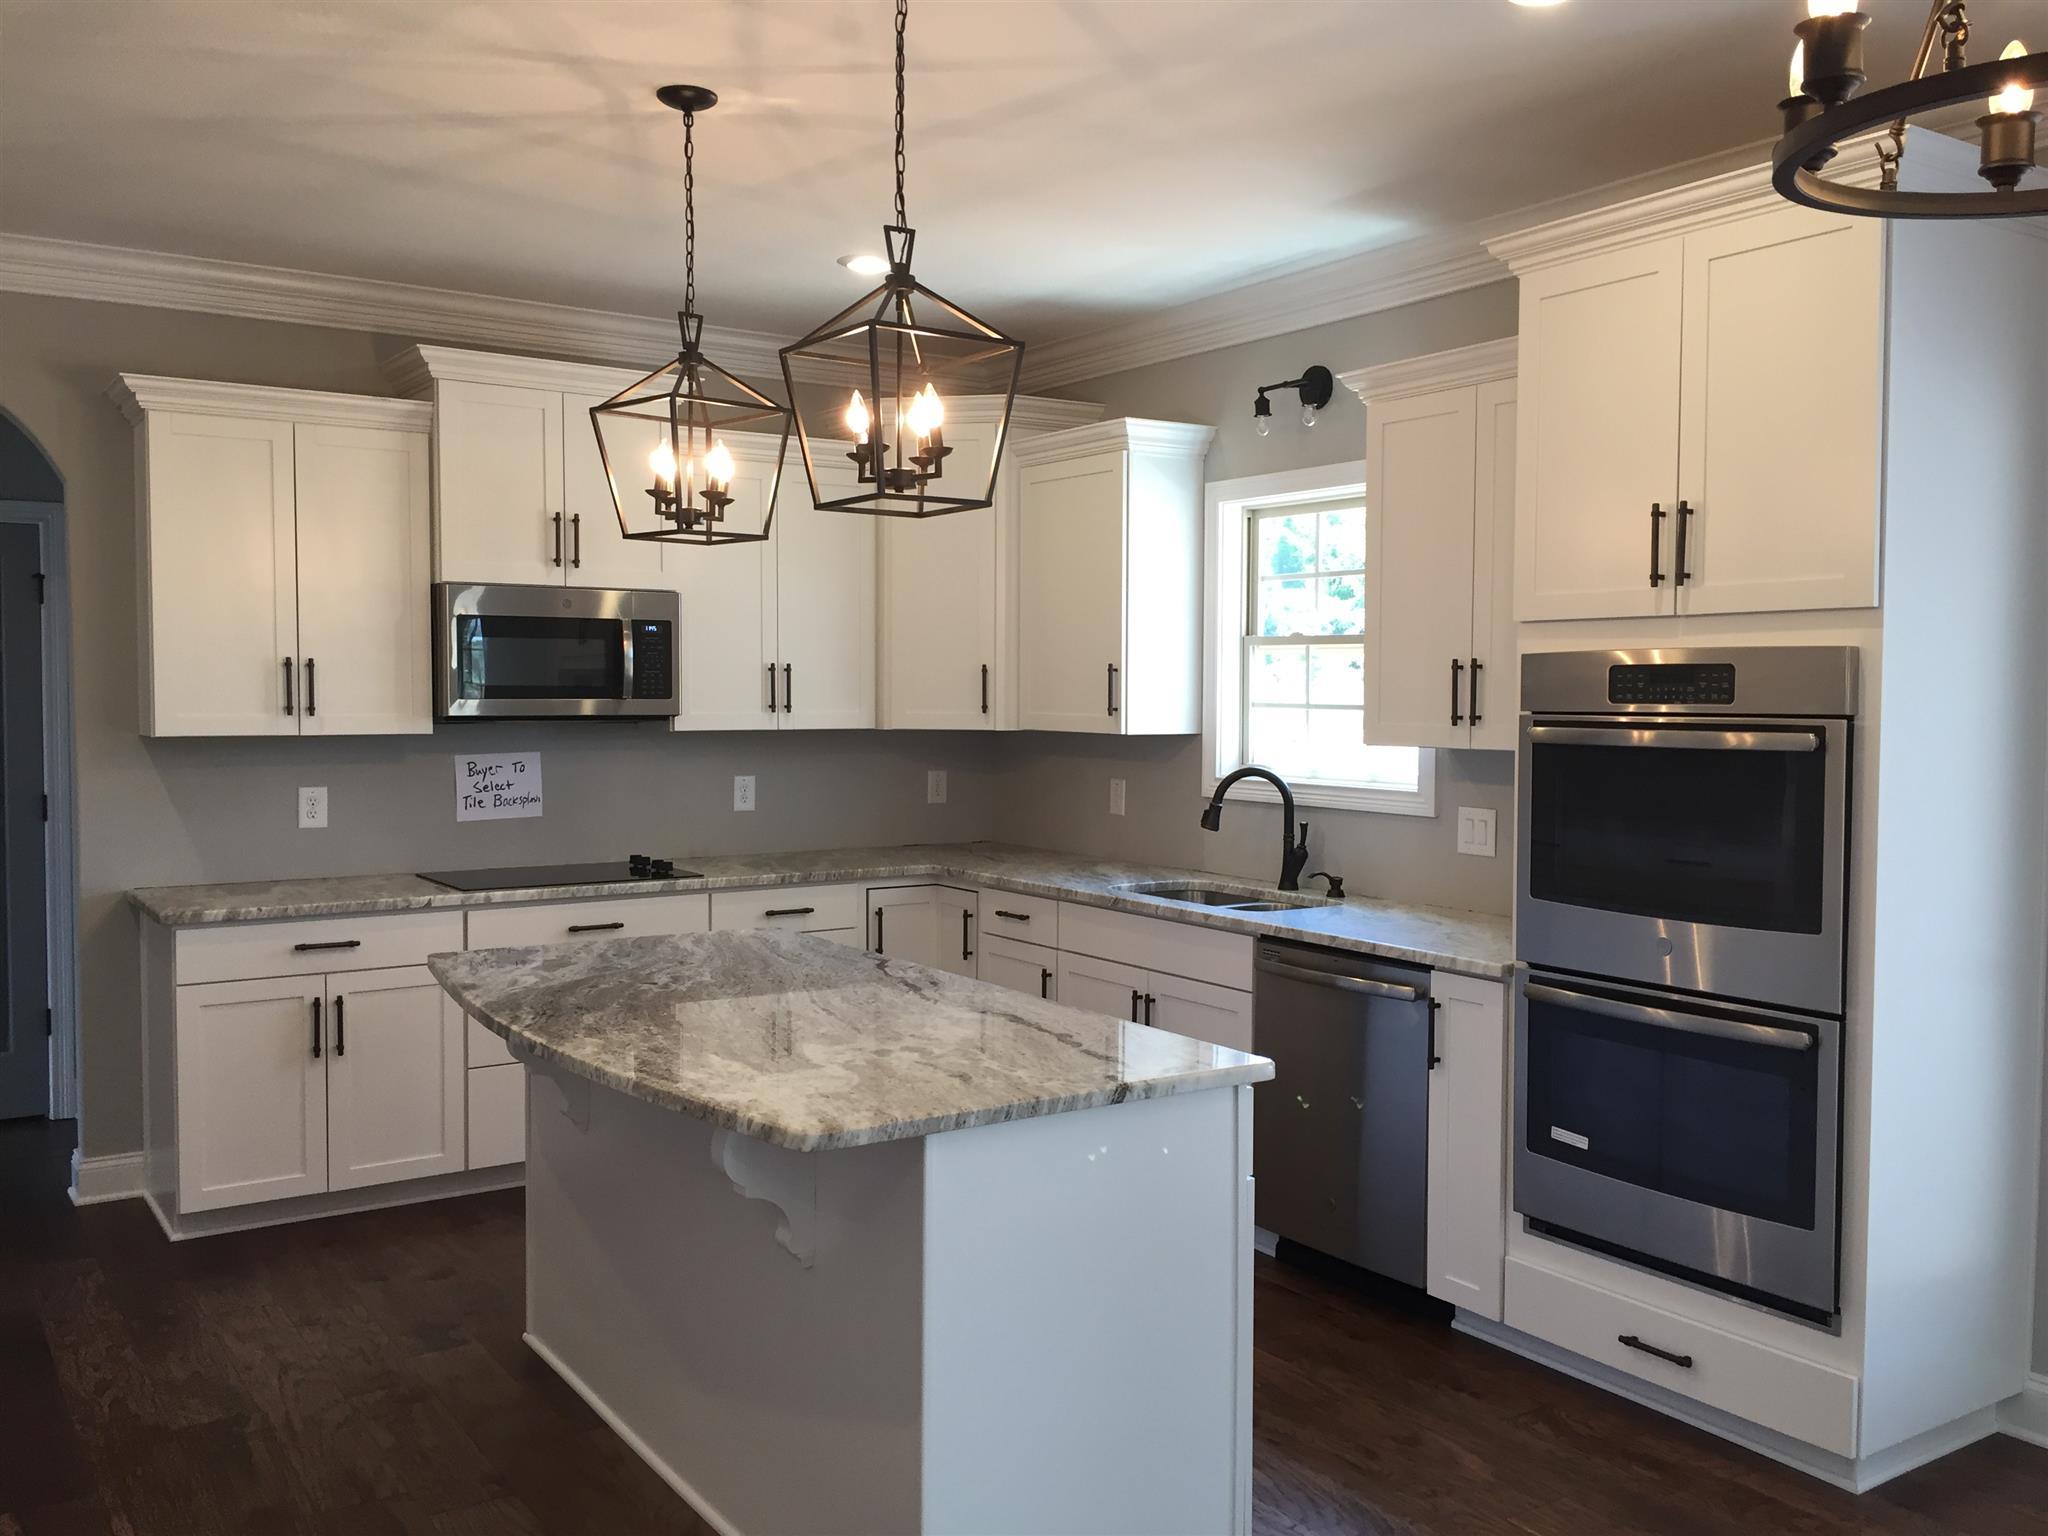 2977 Eliza Dr, Clarksville, TN 37043 - Clarksville, TN real estate listing